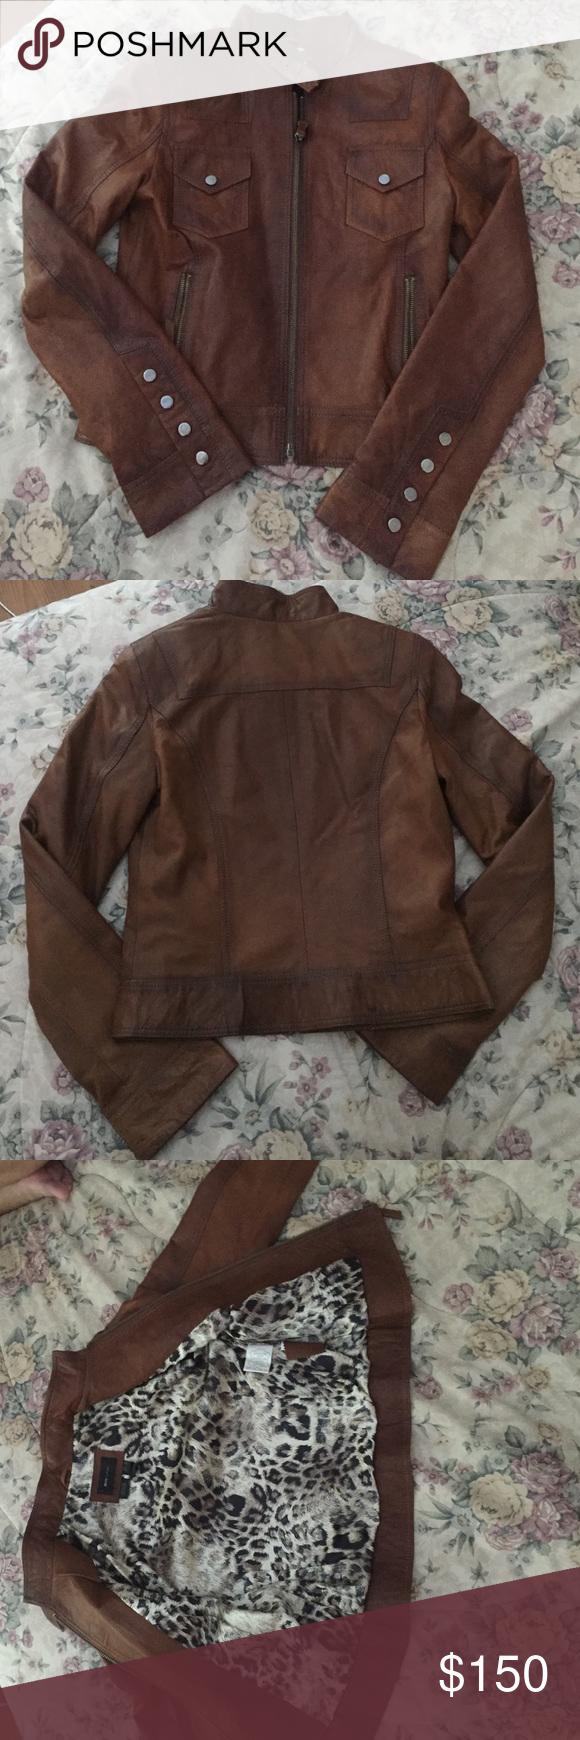 Genuine Turkish Leather Jacket Leather Jacket Jackets Clothes Design [ 1740 x 580 Pixel ]